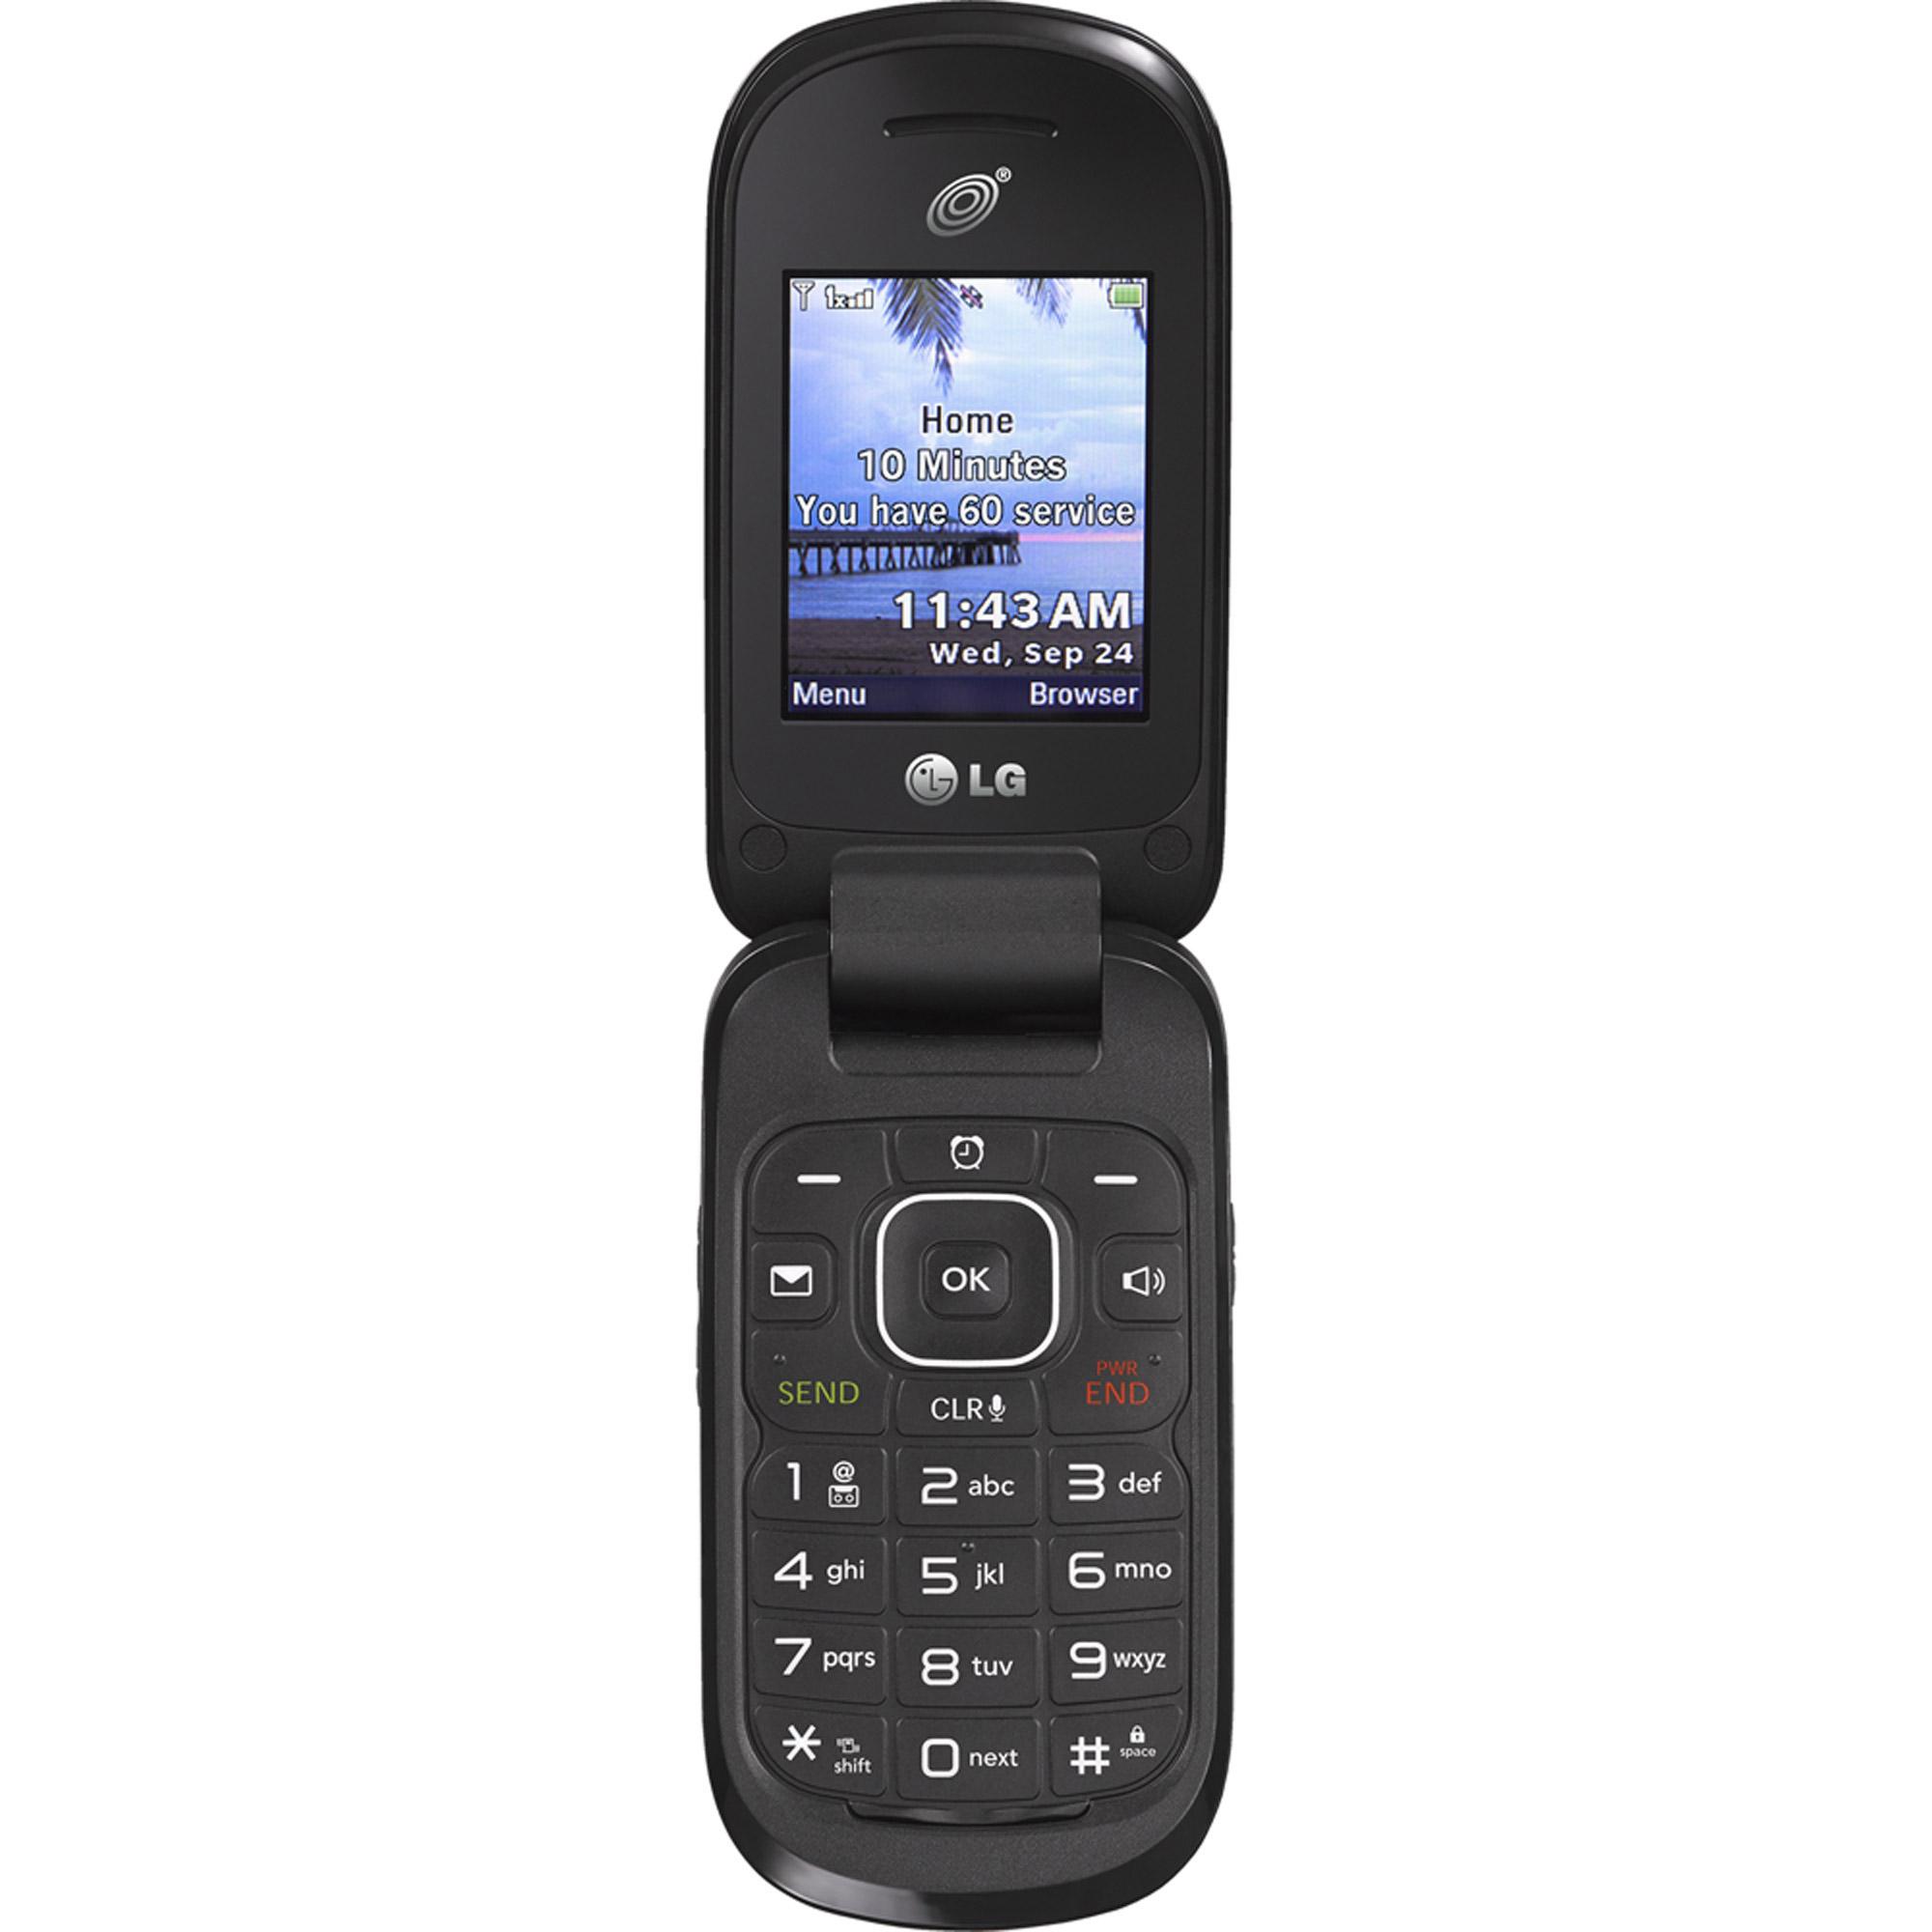 Phone Backgrounds, Compatible - PC, Mobile, Gadgets| 2000x2000 px